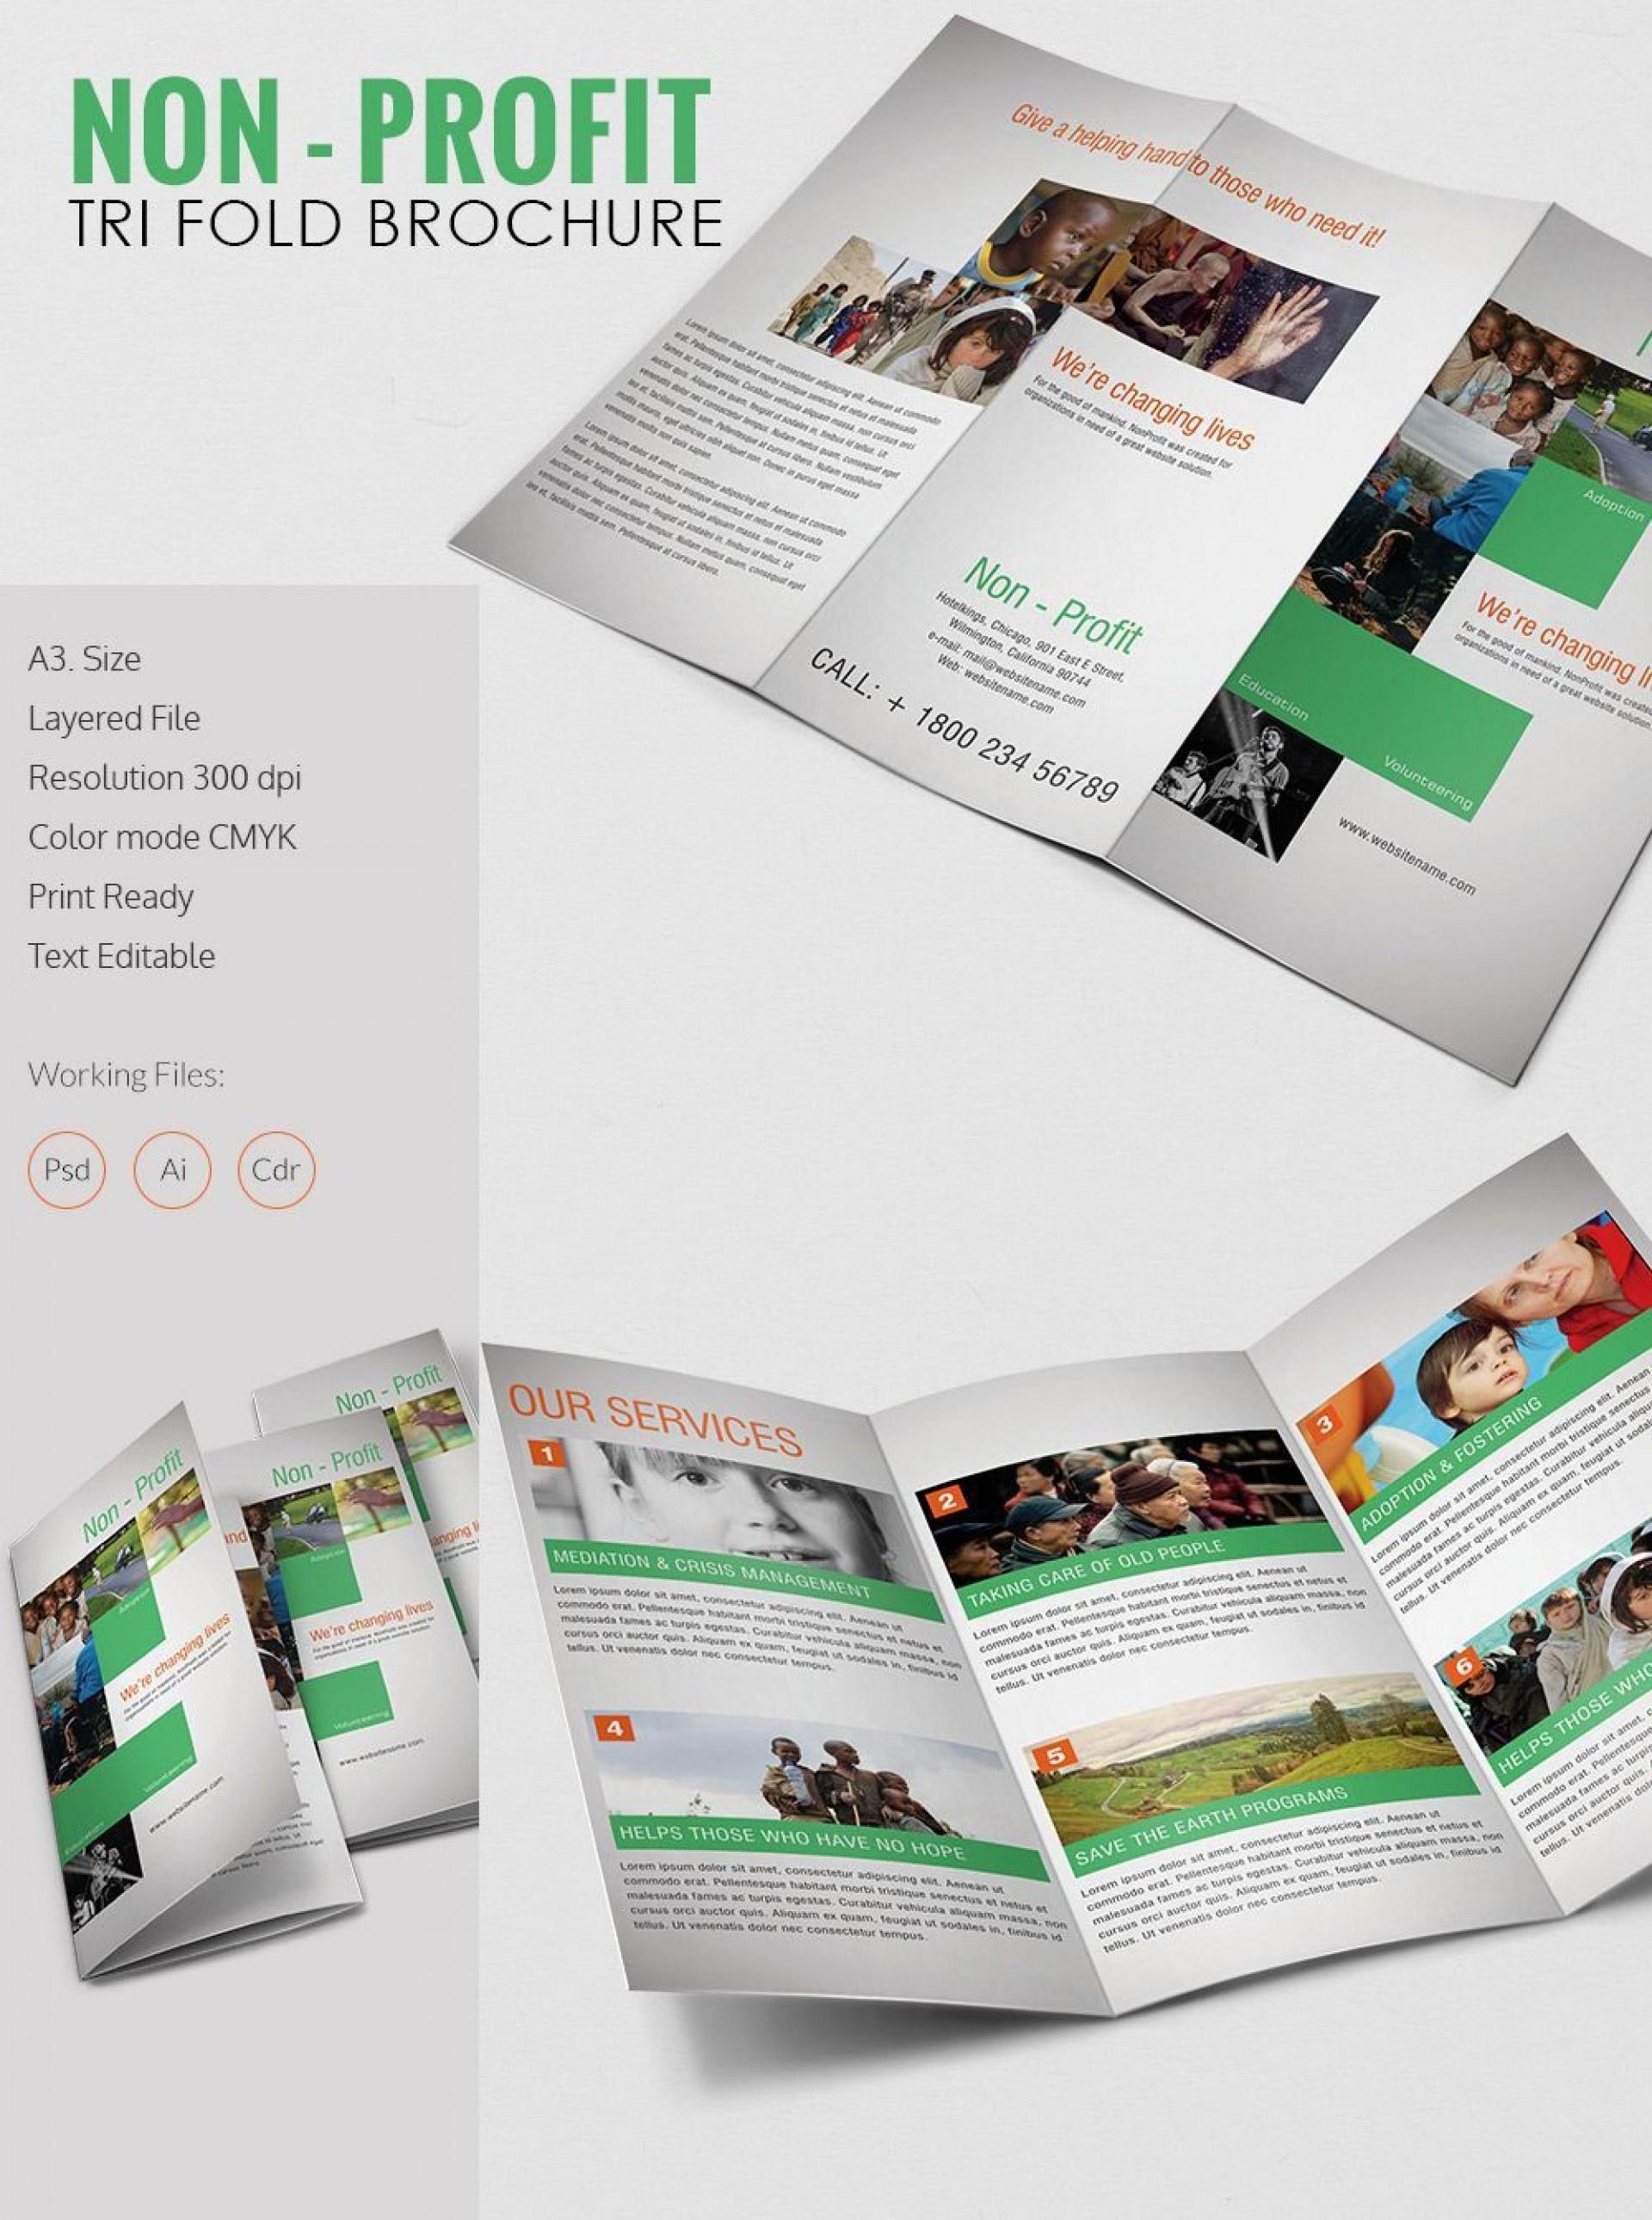 002 Stirring Indesign Trifold Brochure Template Photo  Tri Fold A4 Bi Free Download1920